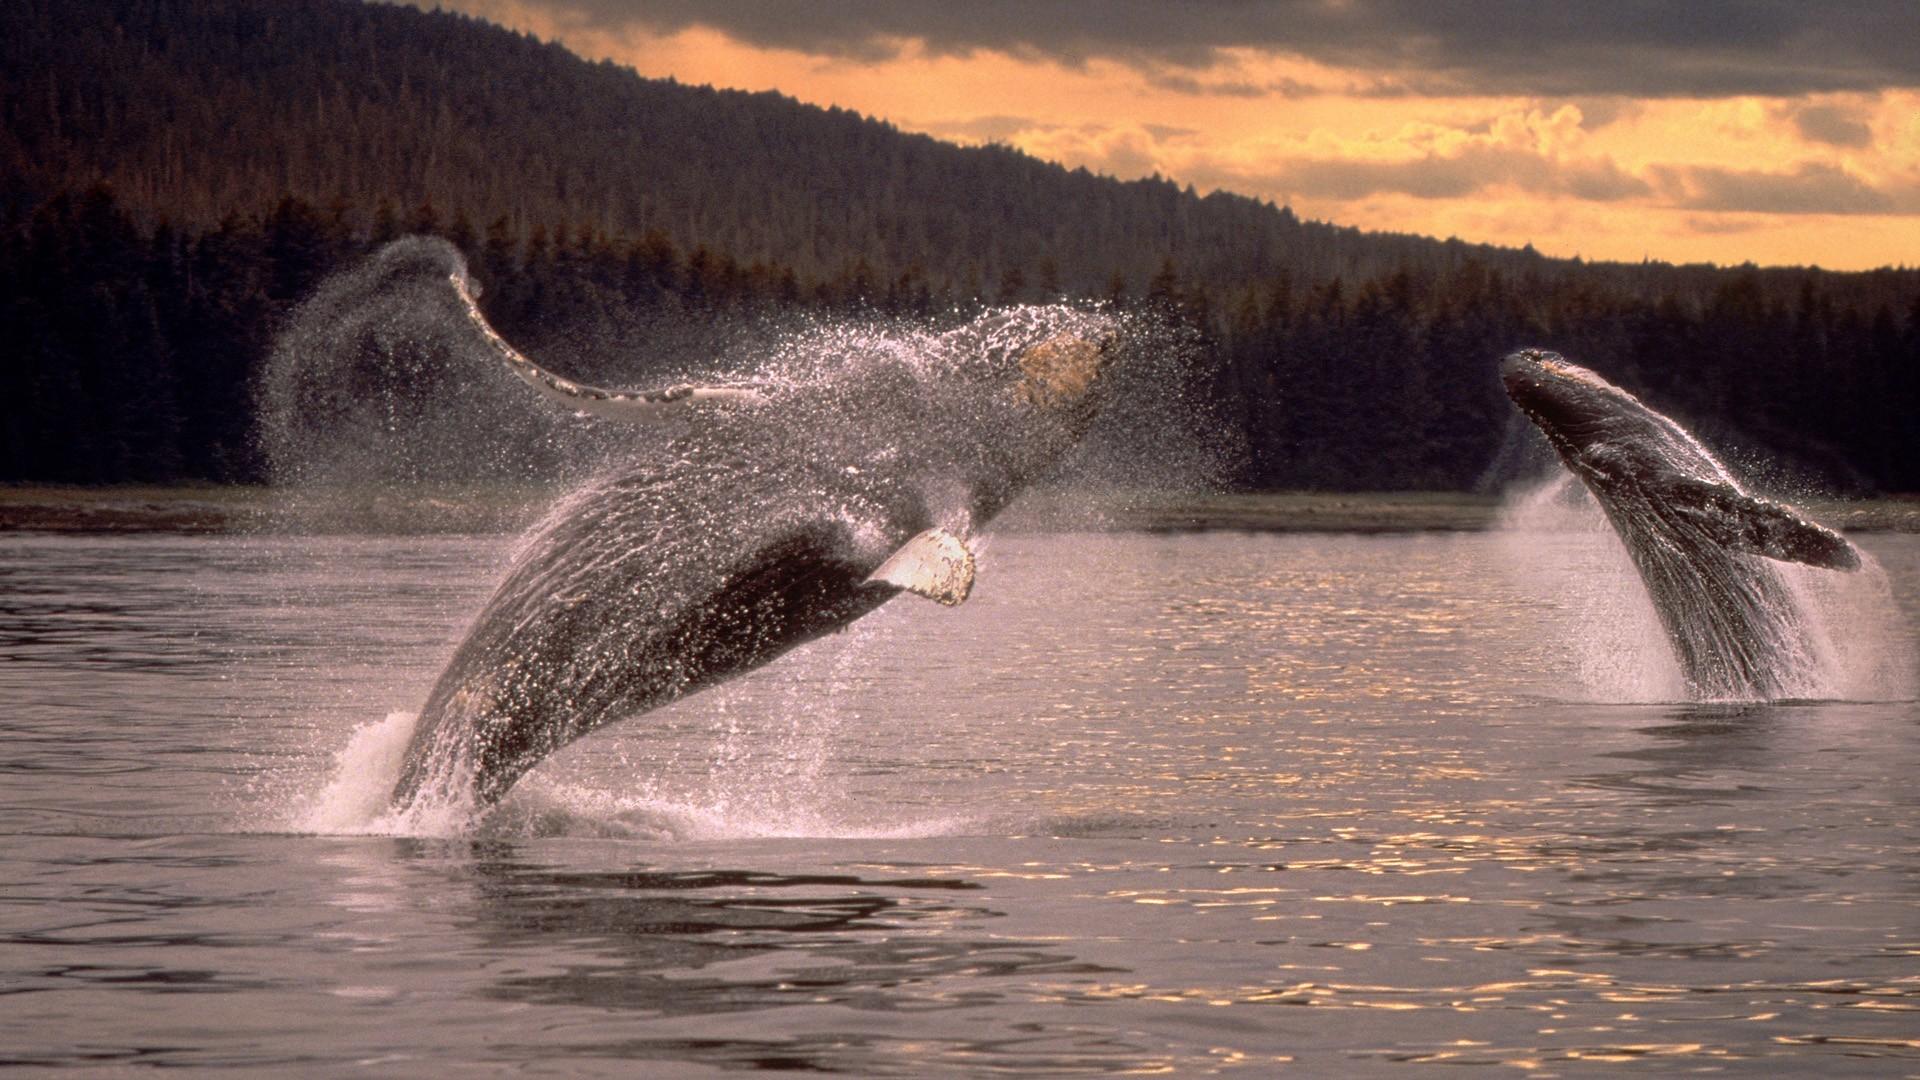 Whales humpback whales wallpaper 1920x1080 185411 1920x1080